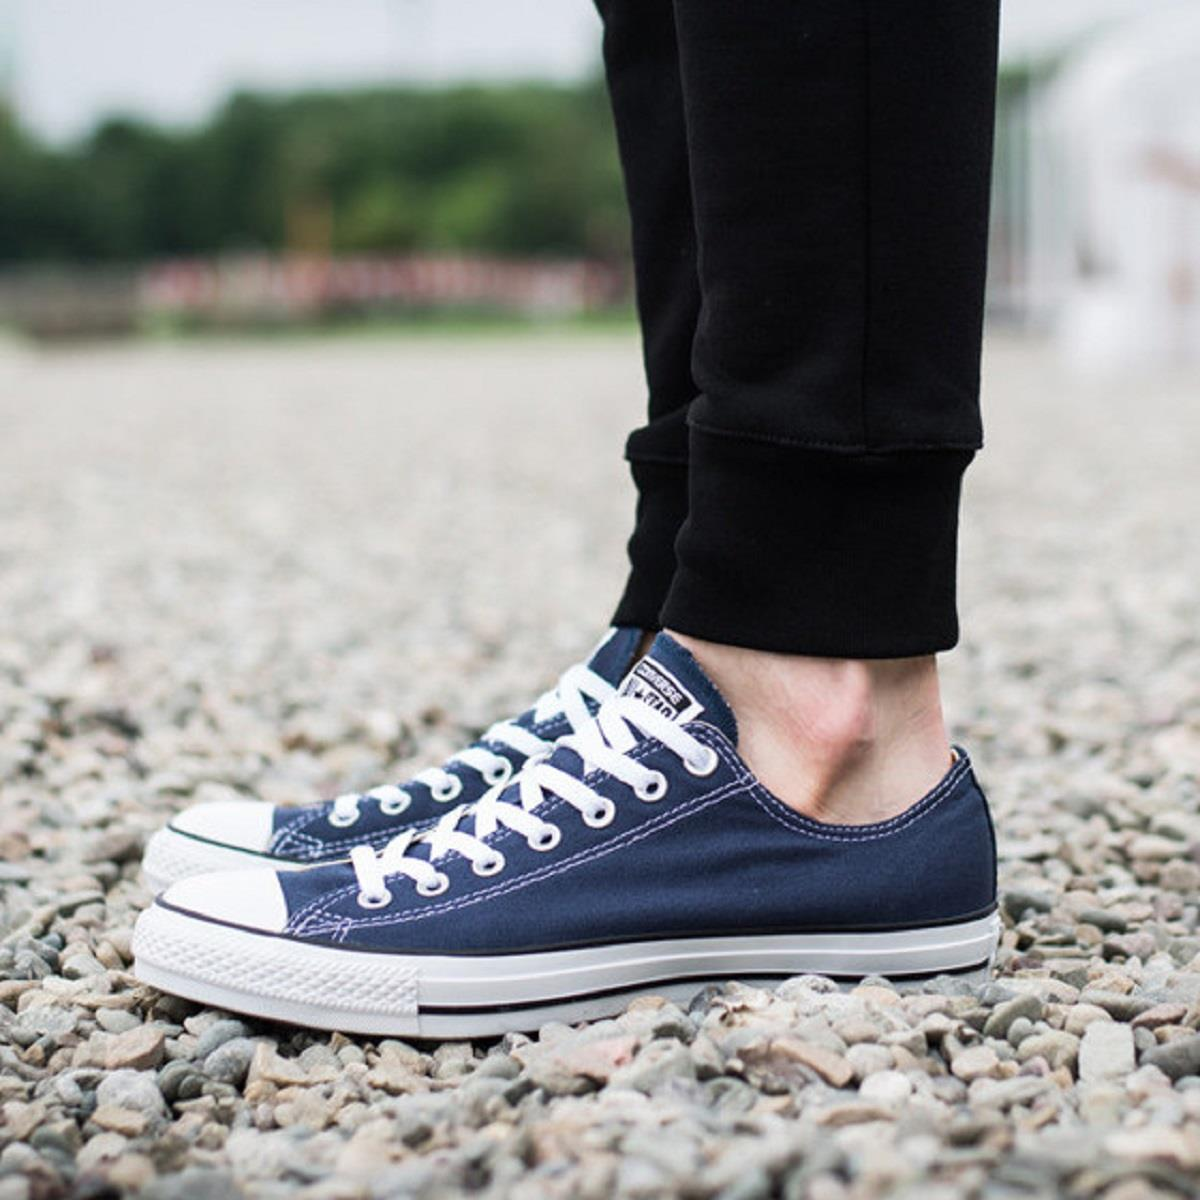 Converse Chuck Taylor màu classic blue